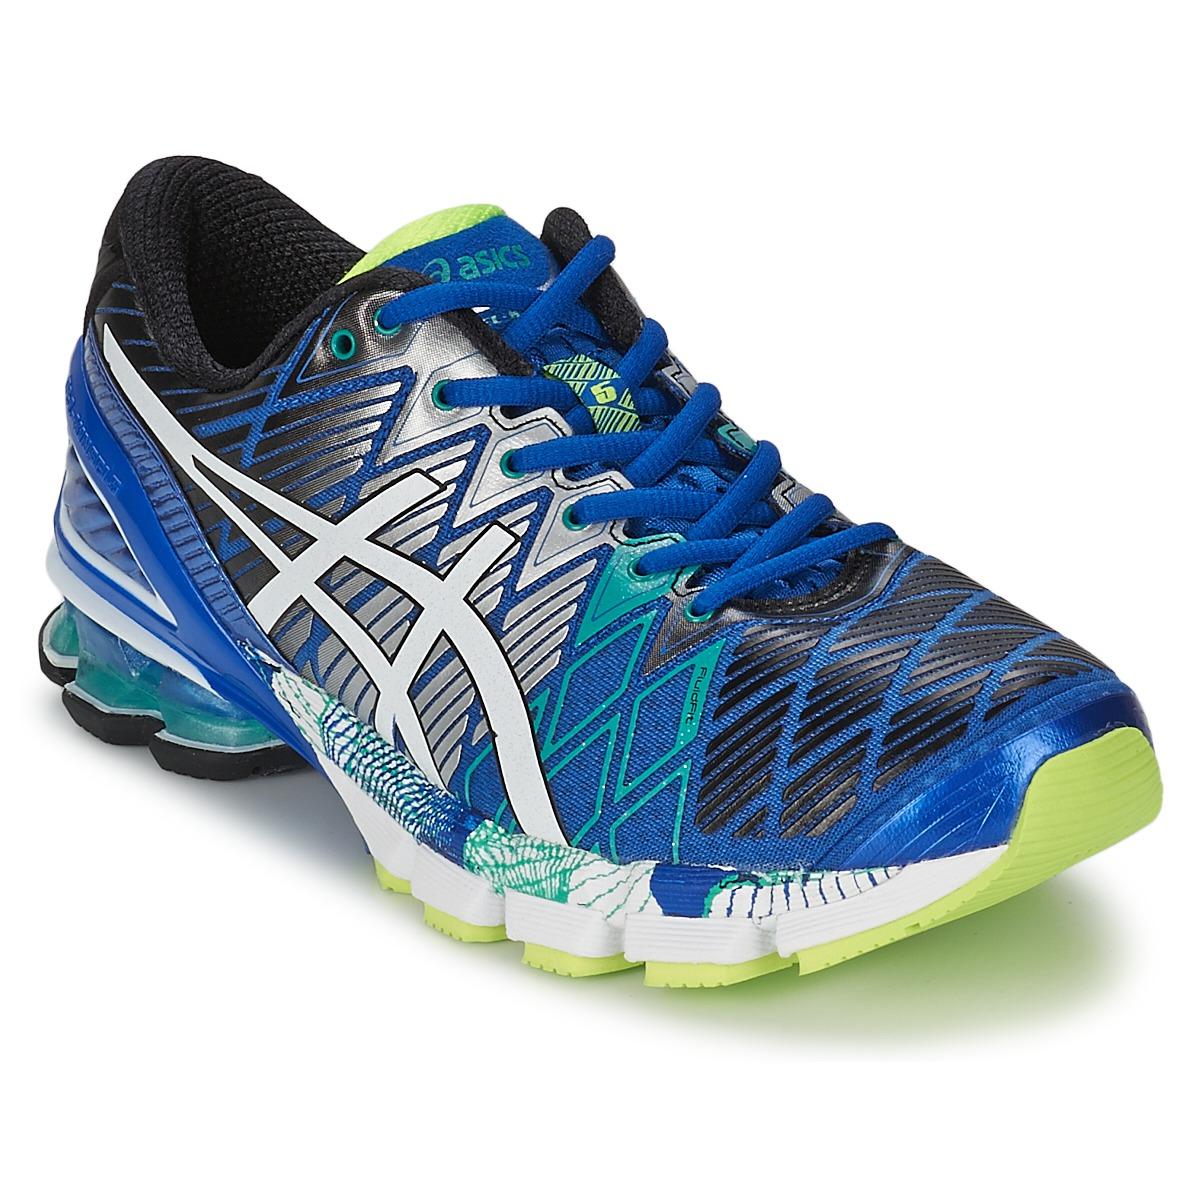 Running-shoes Asics GEL-KINSEI 5 Blue / White / Green